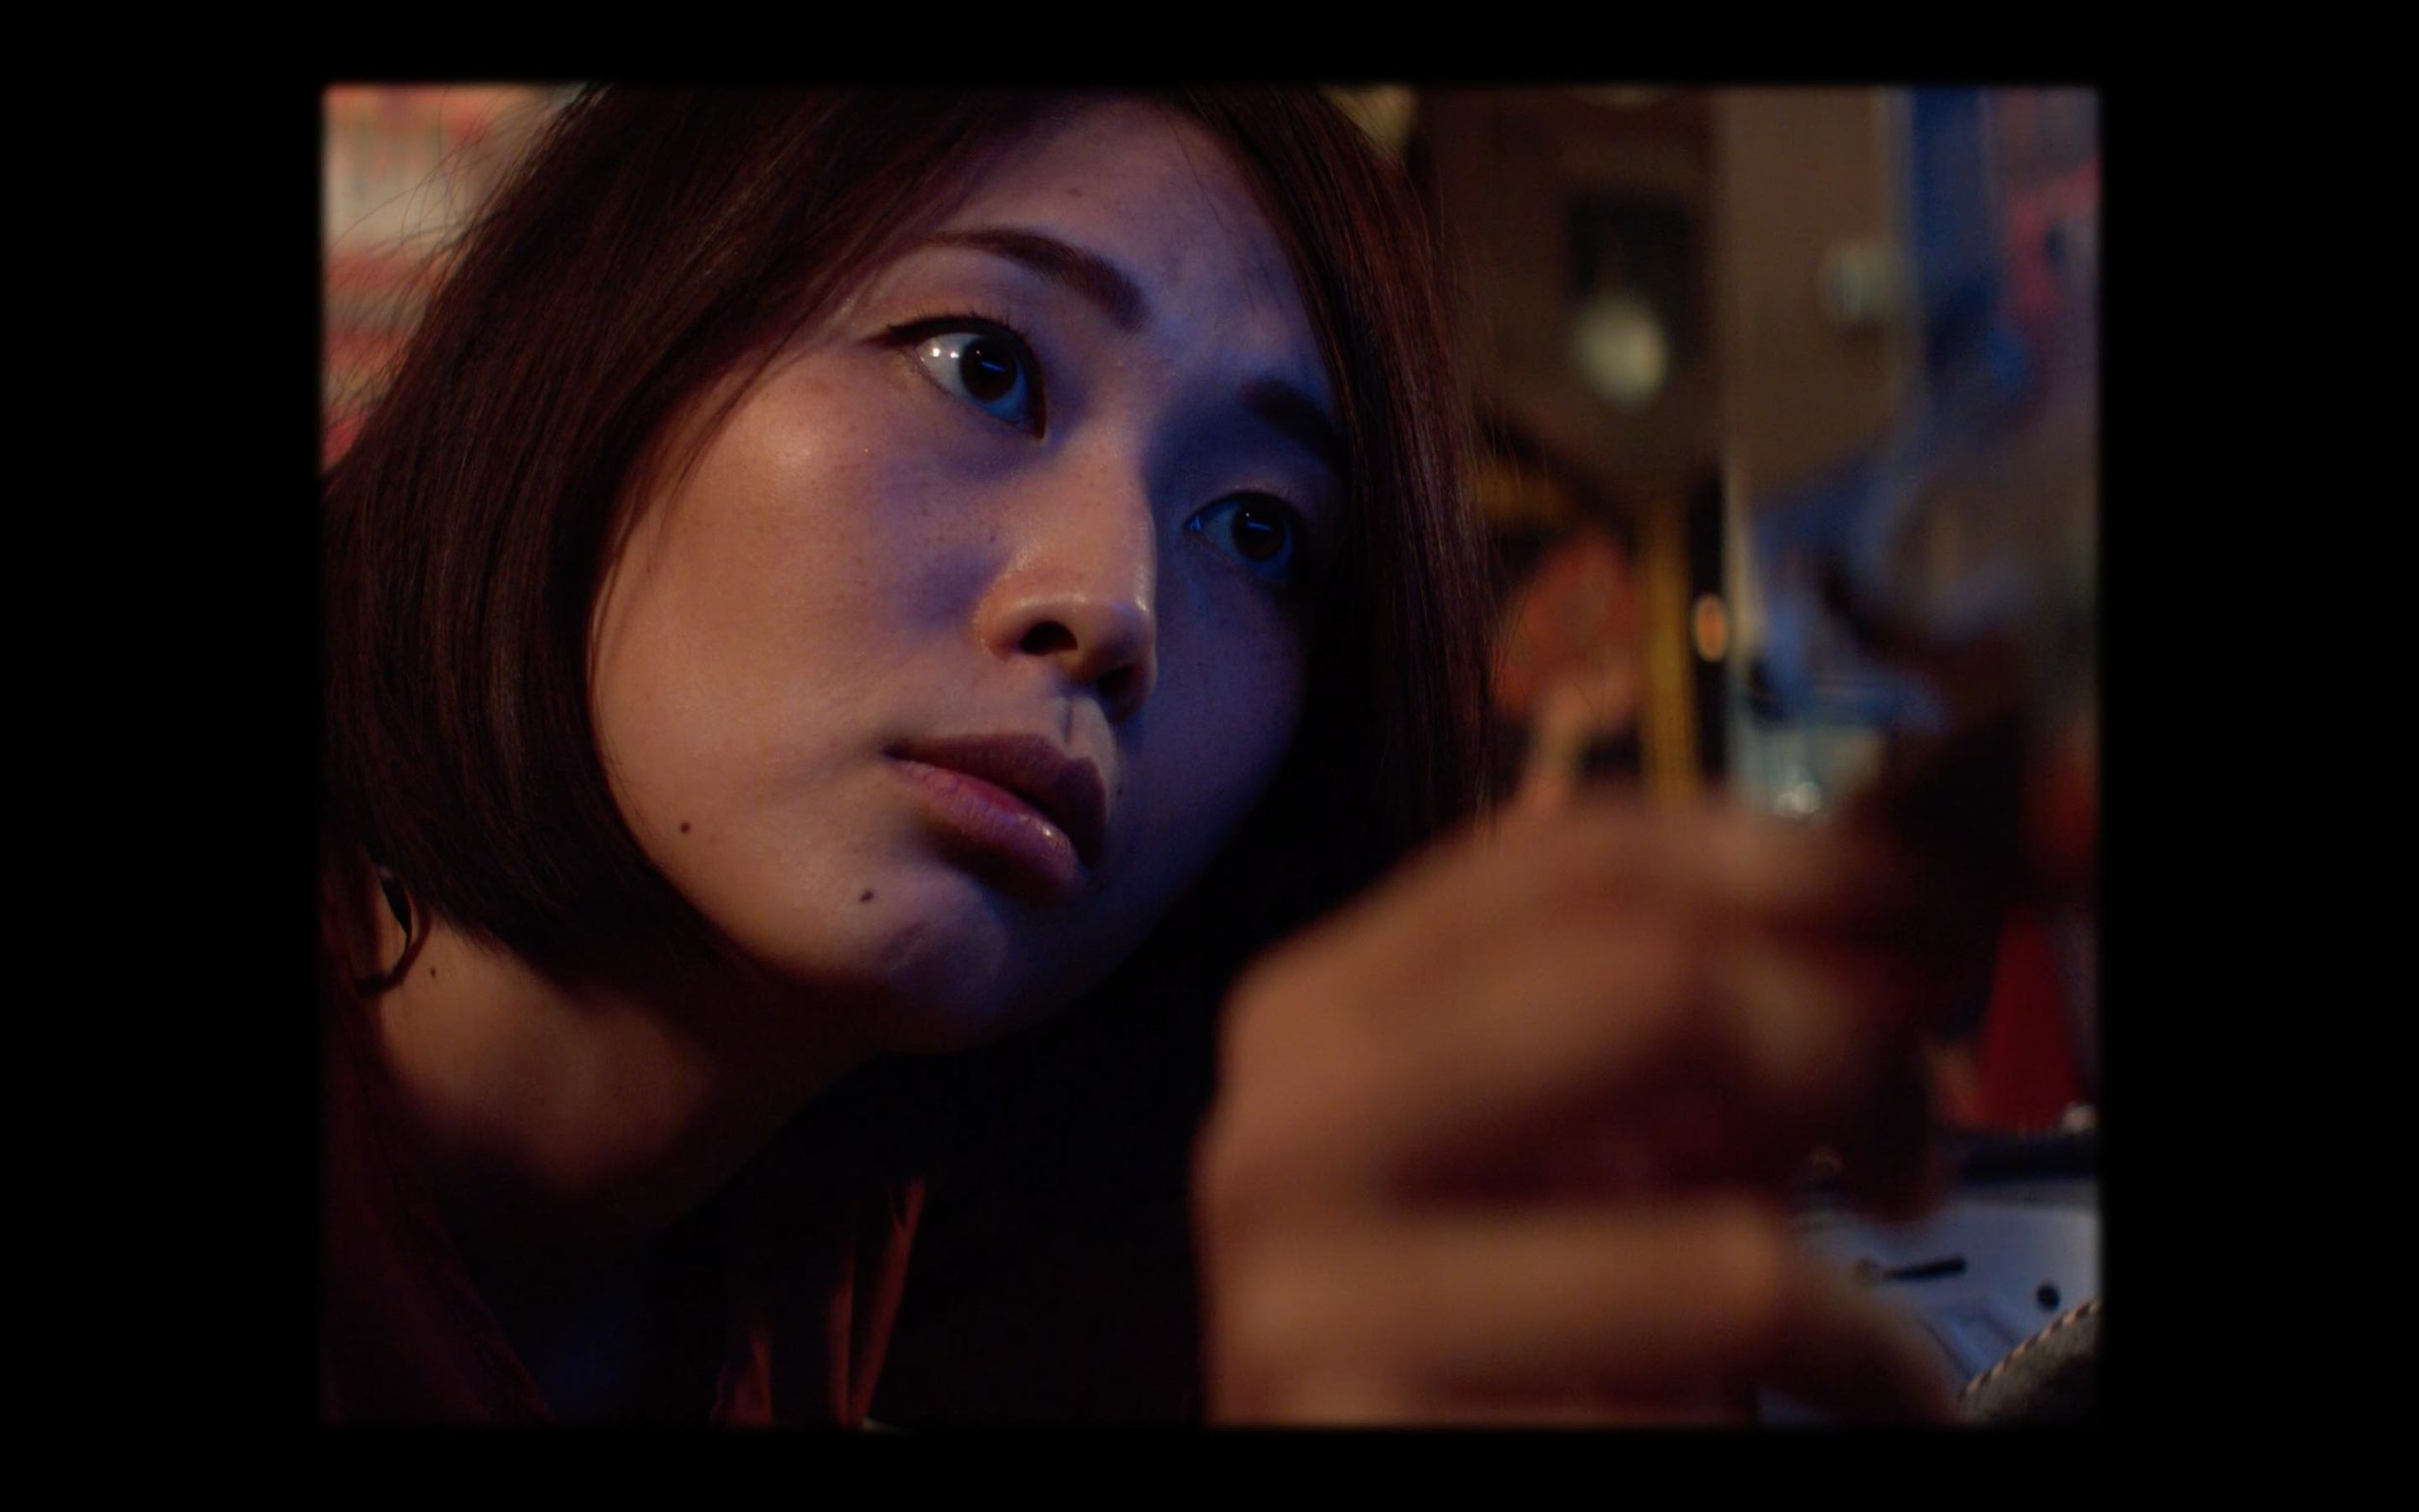 cinematography japan tokyo girl dark blue eye four third hand close up dop